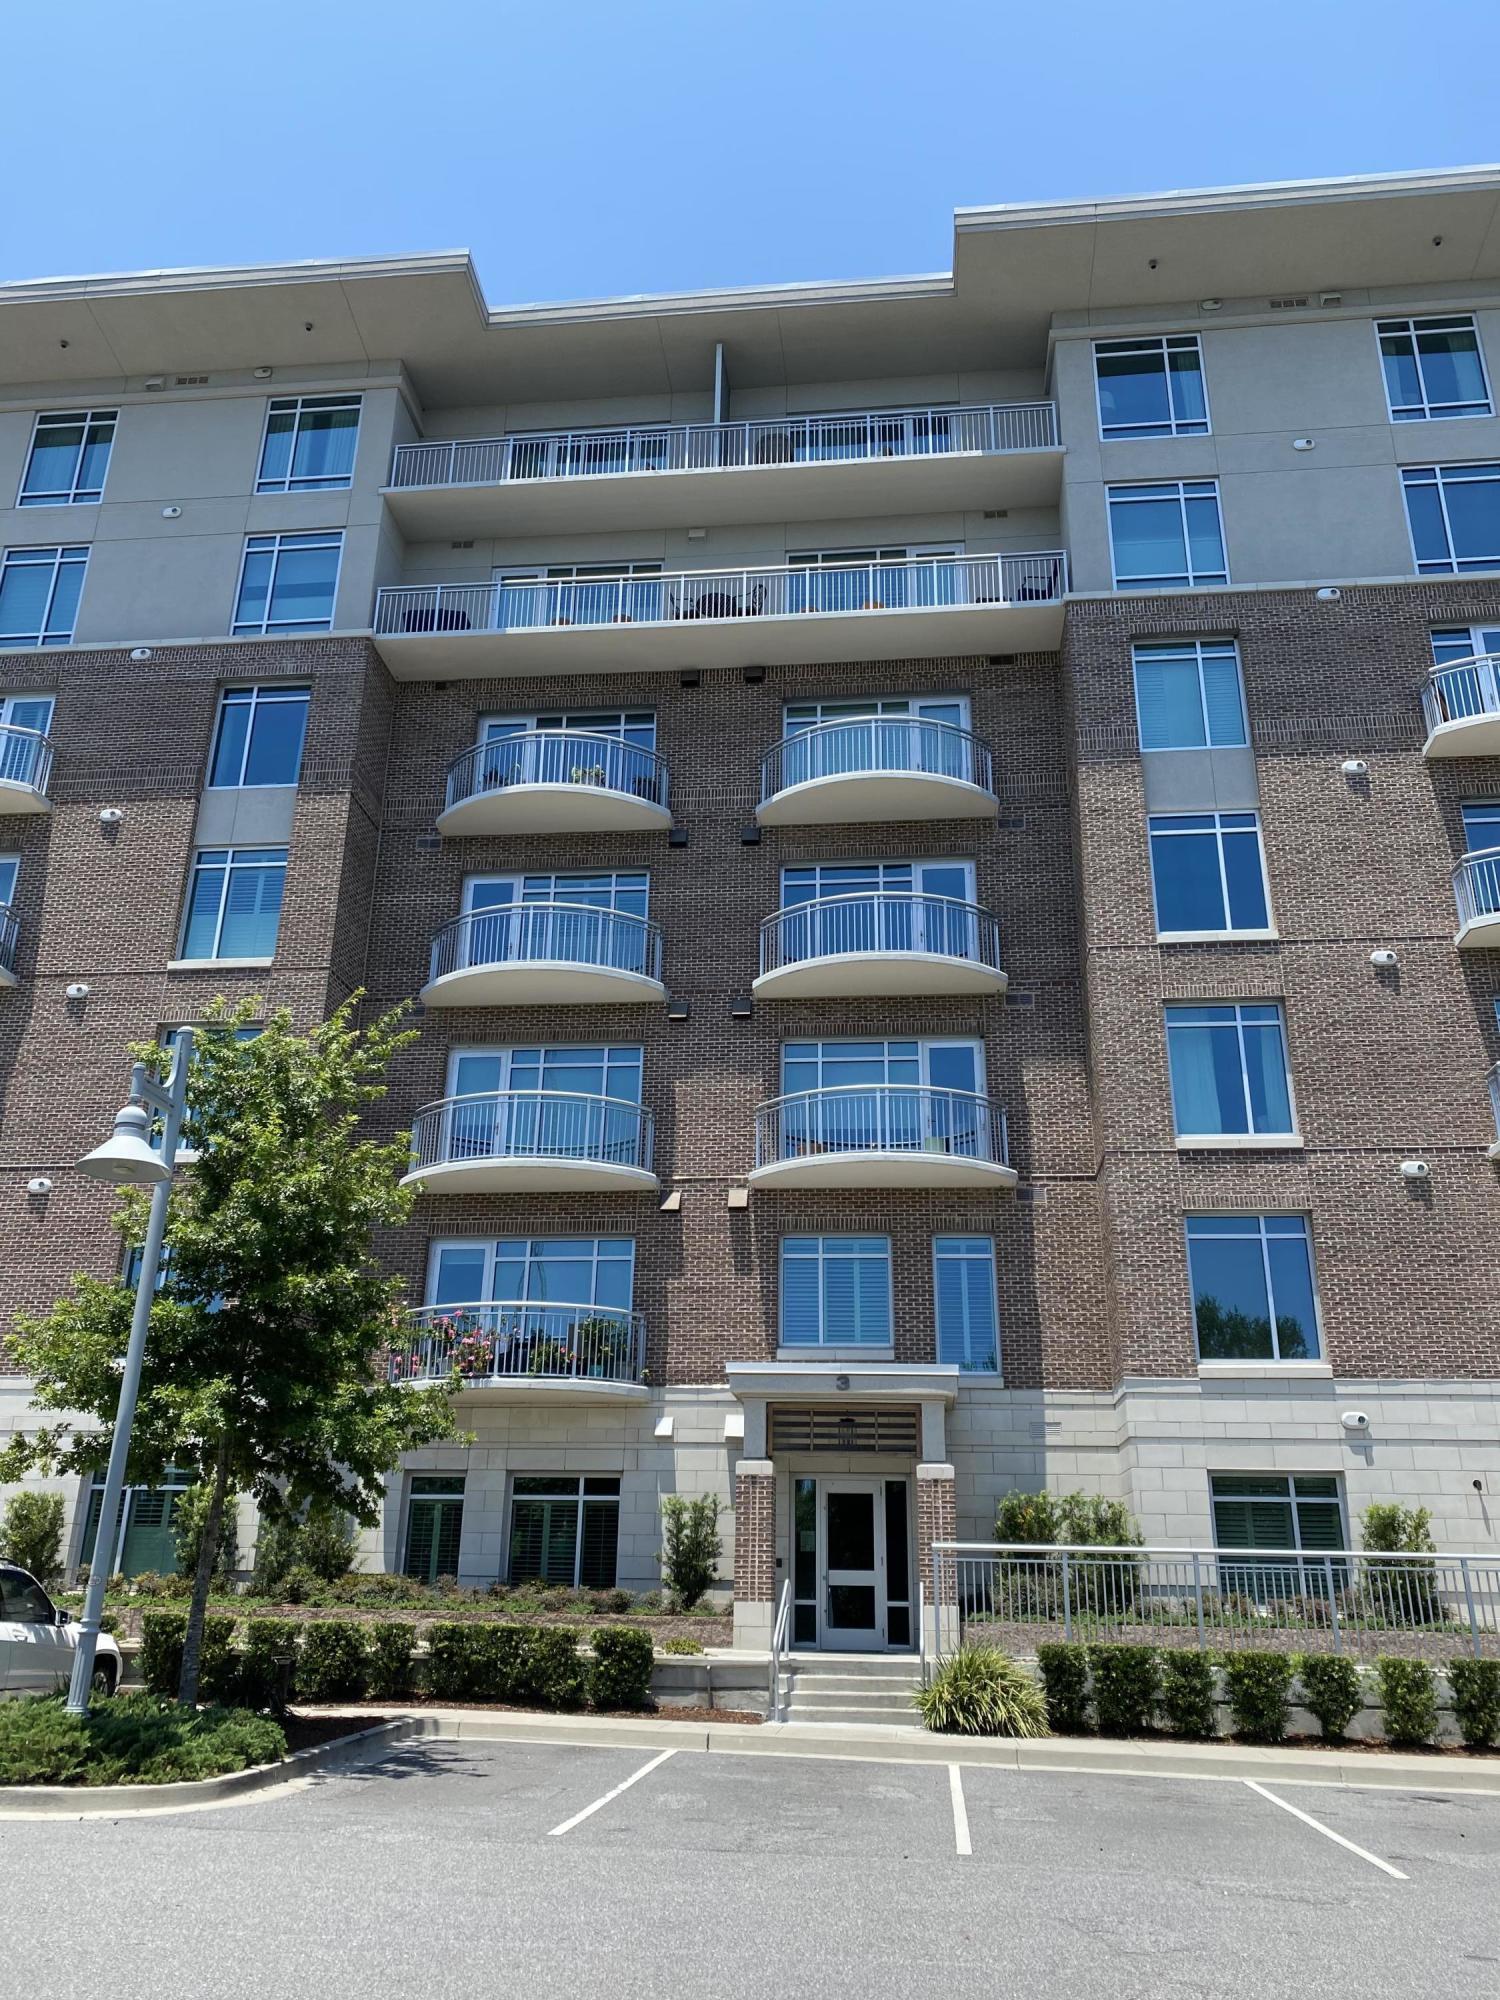 Tides Condominiums Homes For Sale - 155 Wingo, Mount Pleasant, SC - 3